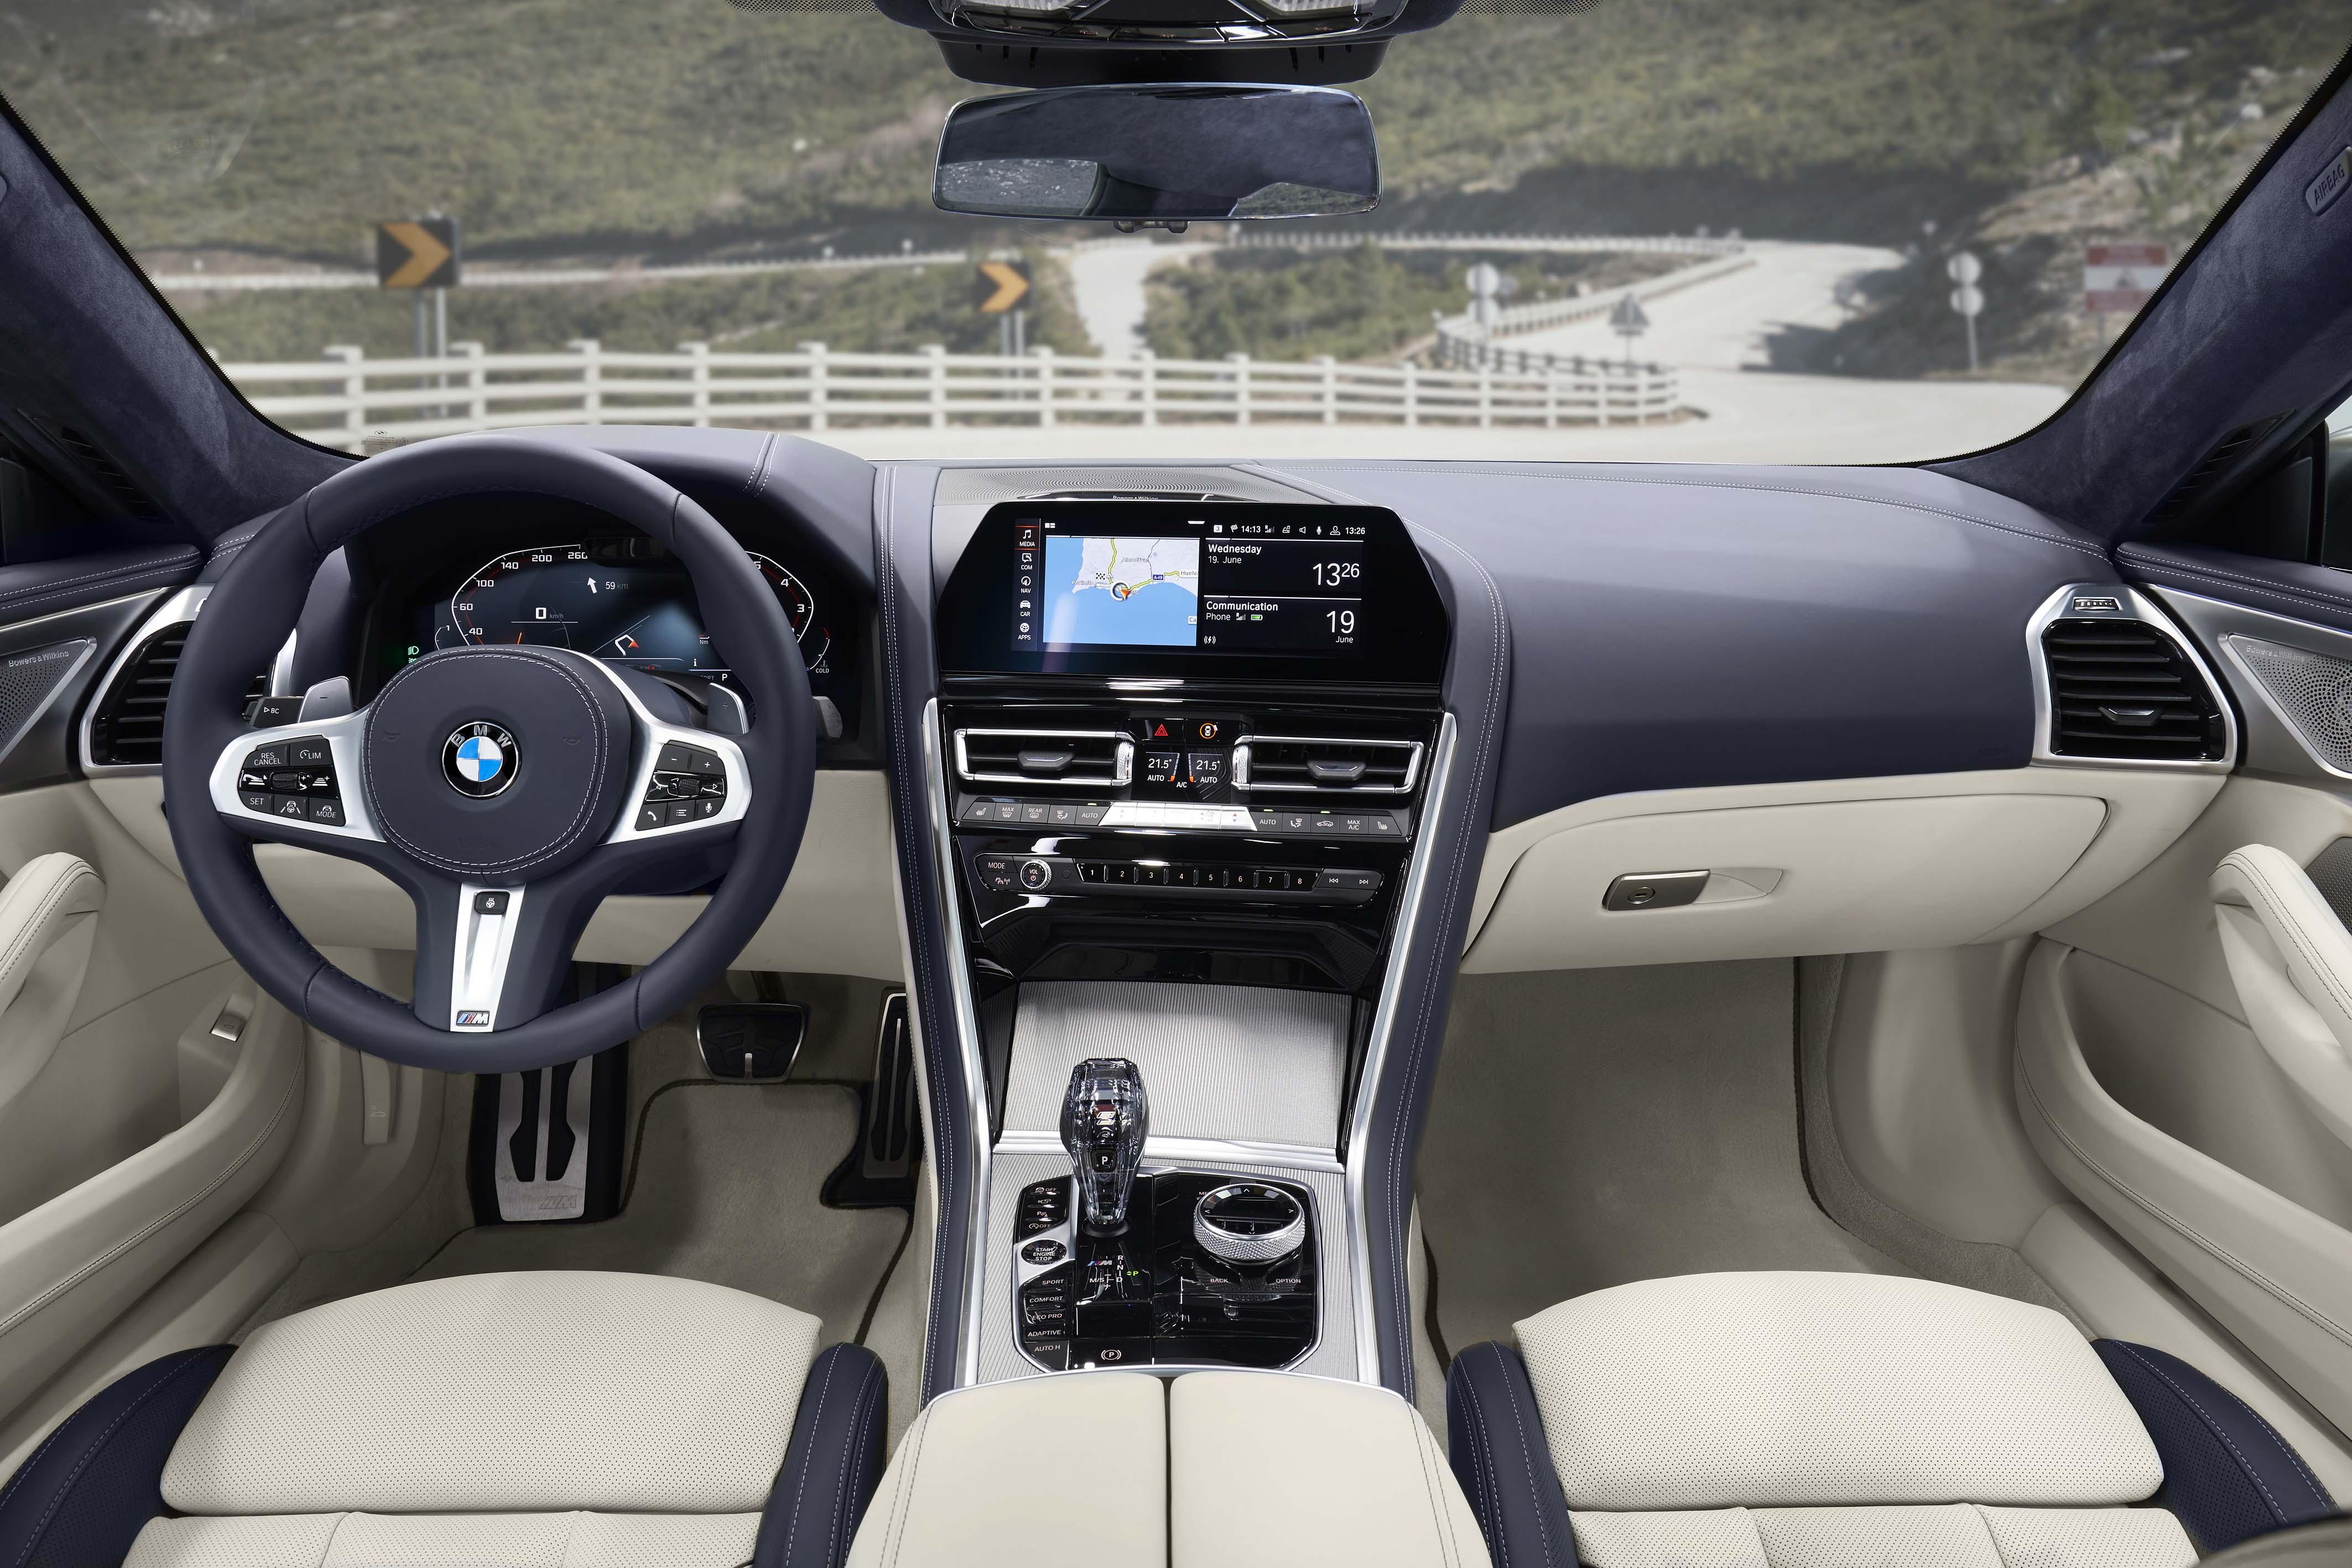 2020 Bmw M850i Xdrive Gran Coupe Bmw Group Test Fest Automotive Rhythms